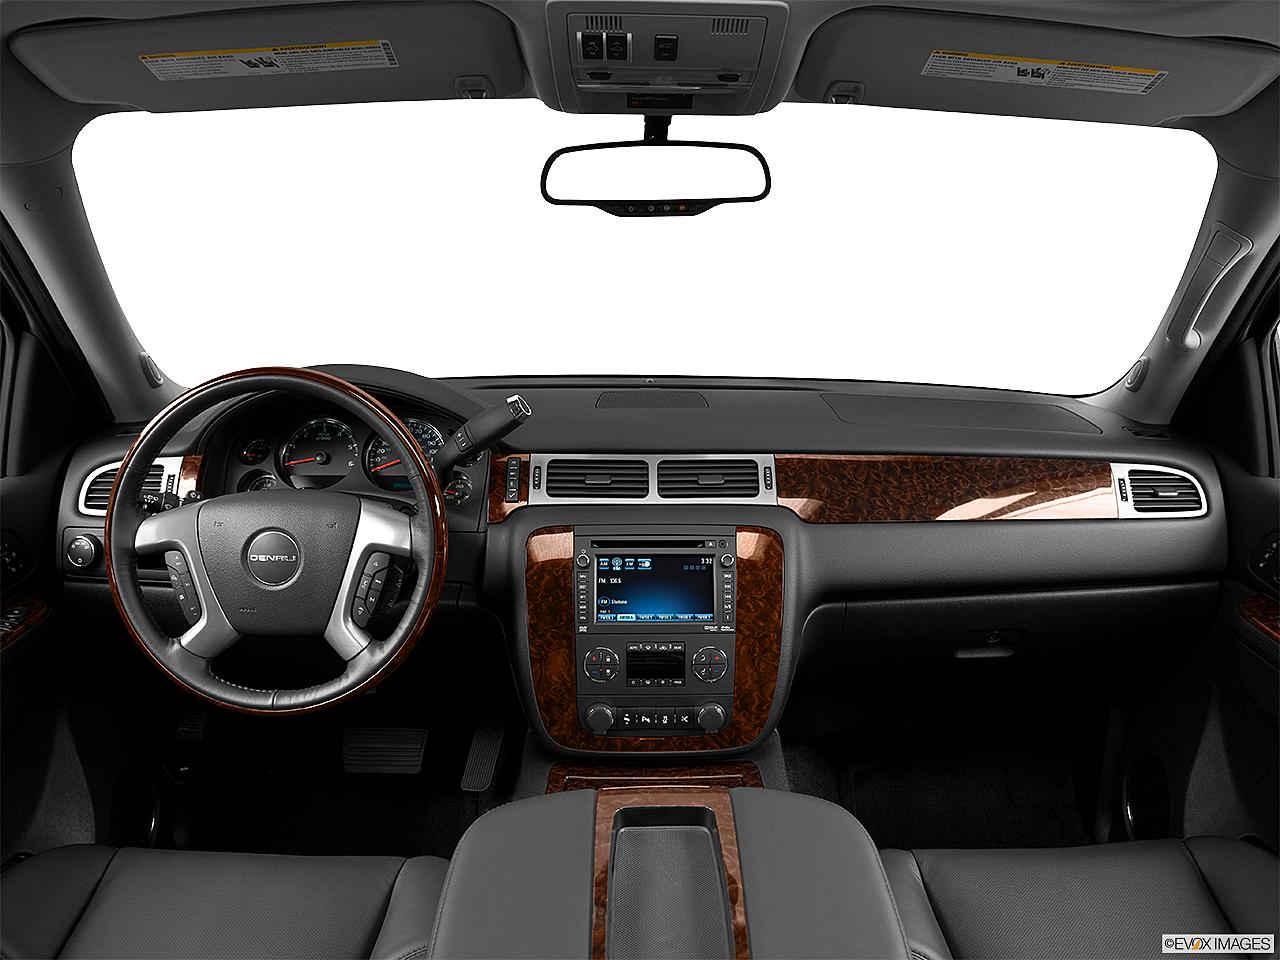 wheel dp and com amazon images gmc door vehicles xl reviews denali yukon specs drive